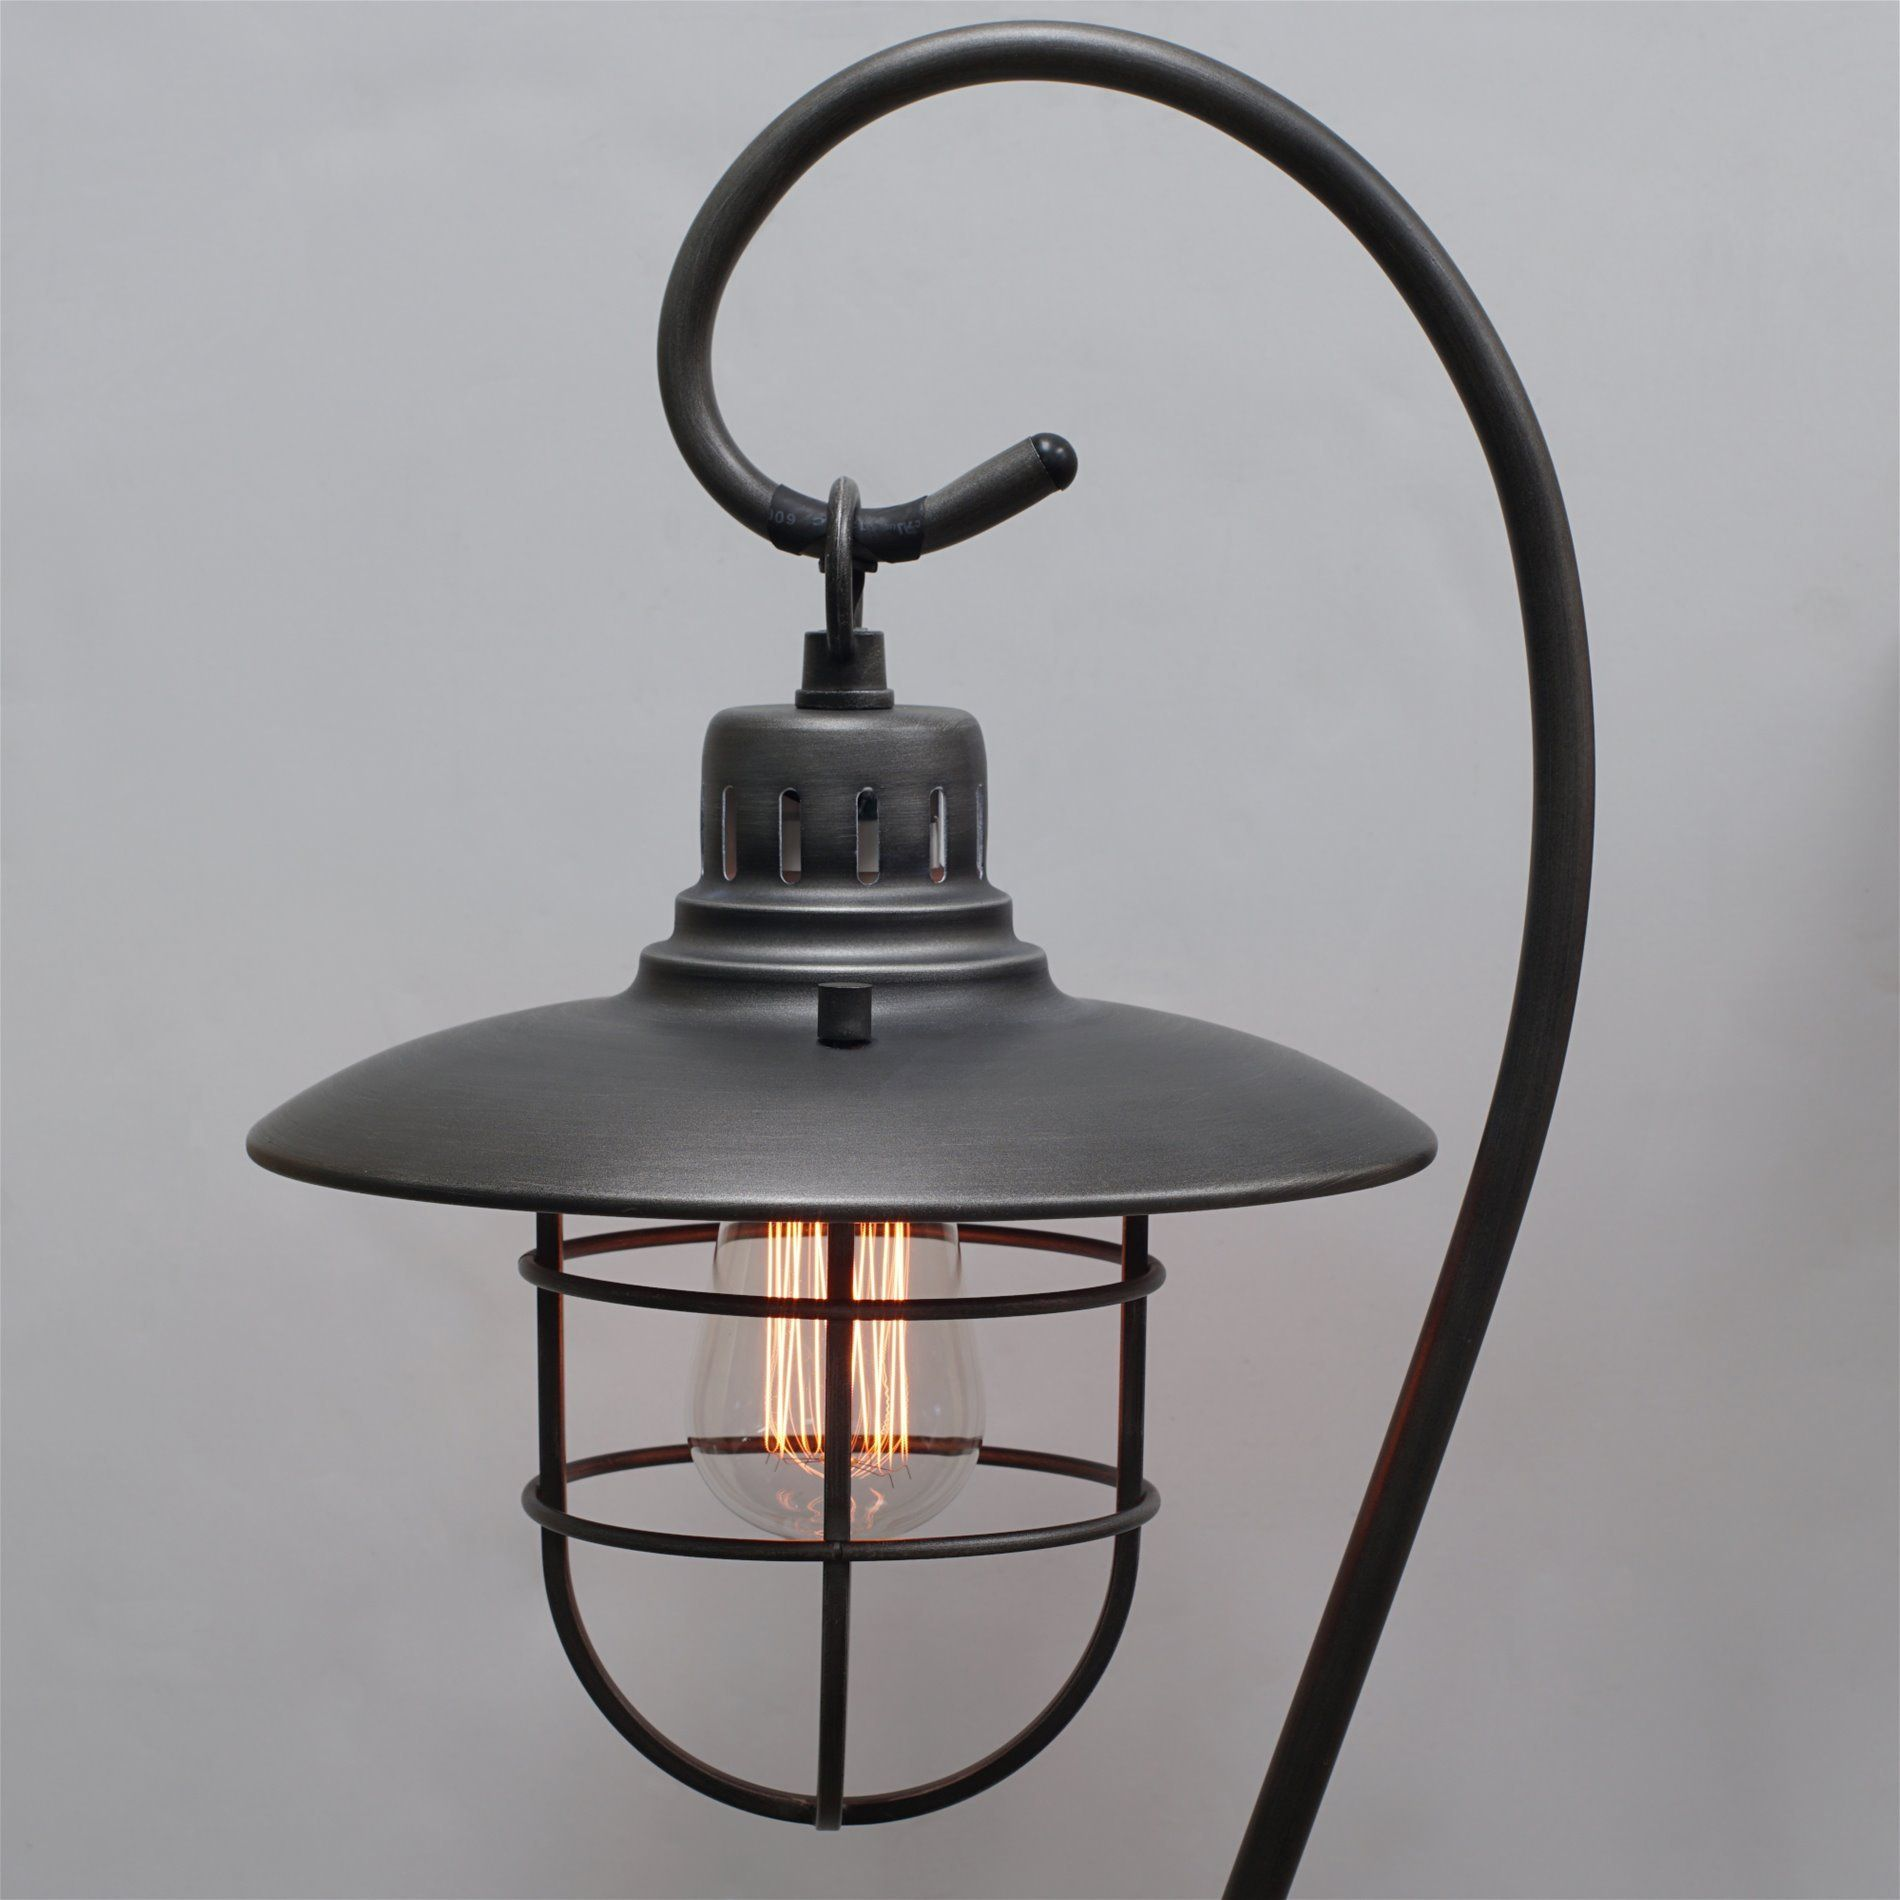 Kira Home Lantern 58 Industrial Floor Lamp Hanging Shade